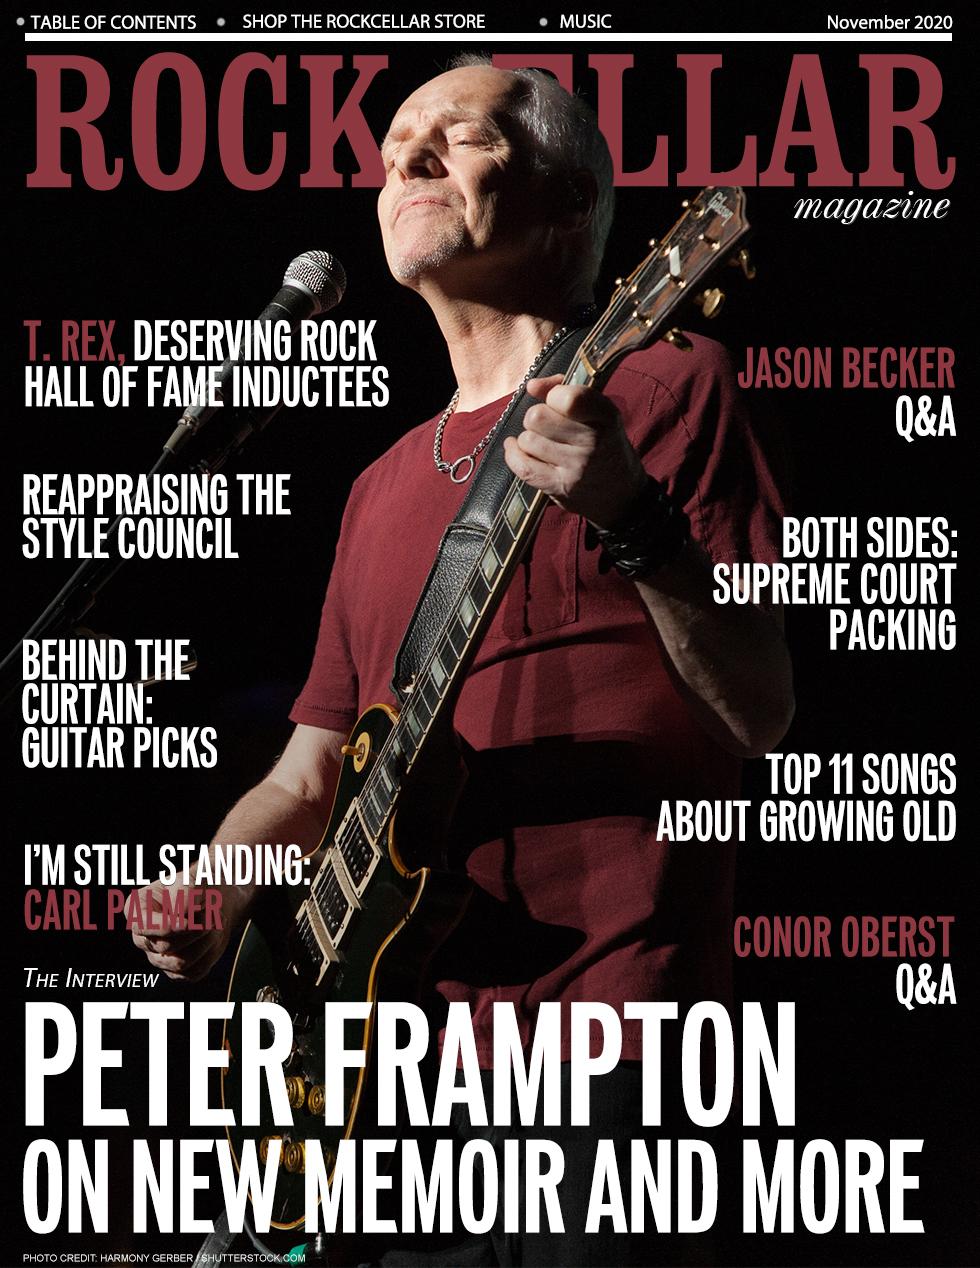 RockCellar Magazine